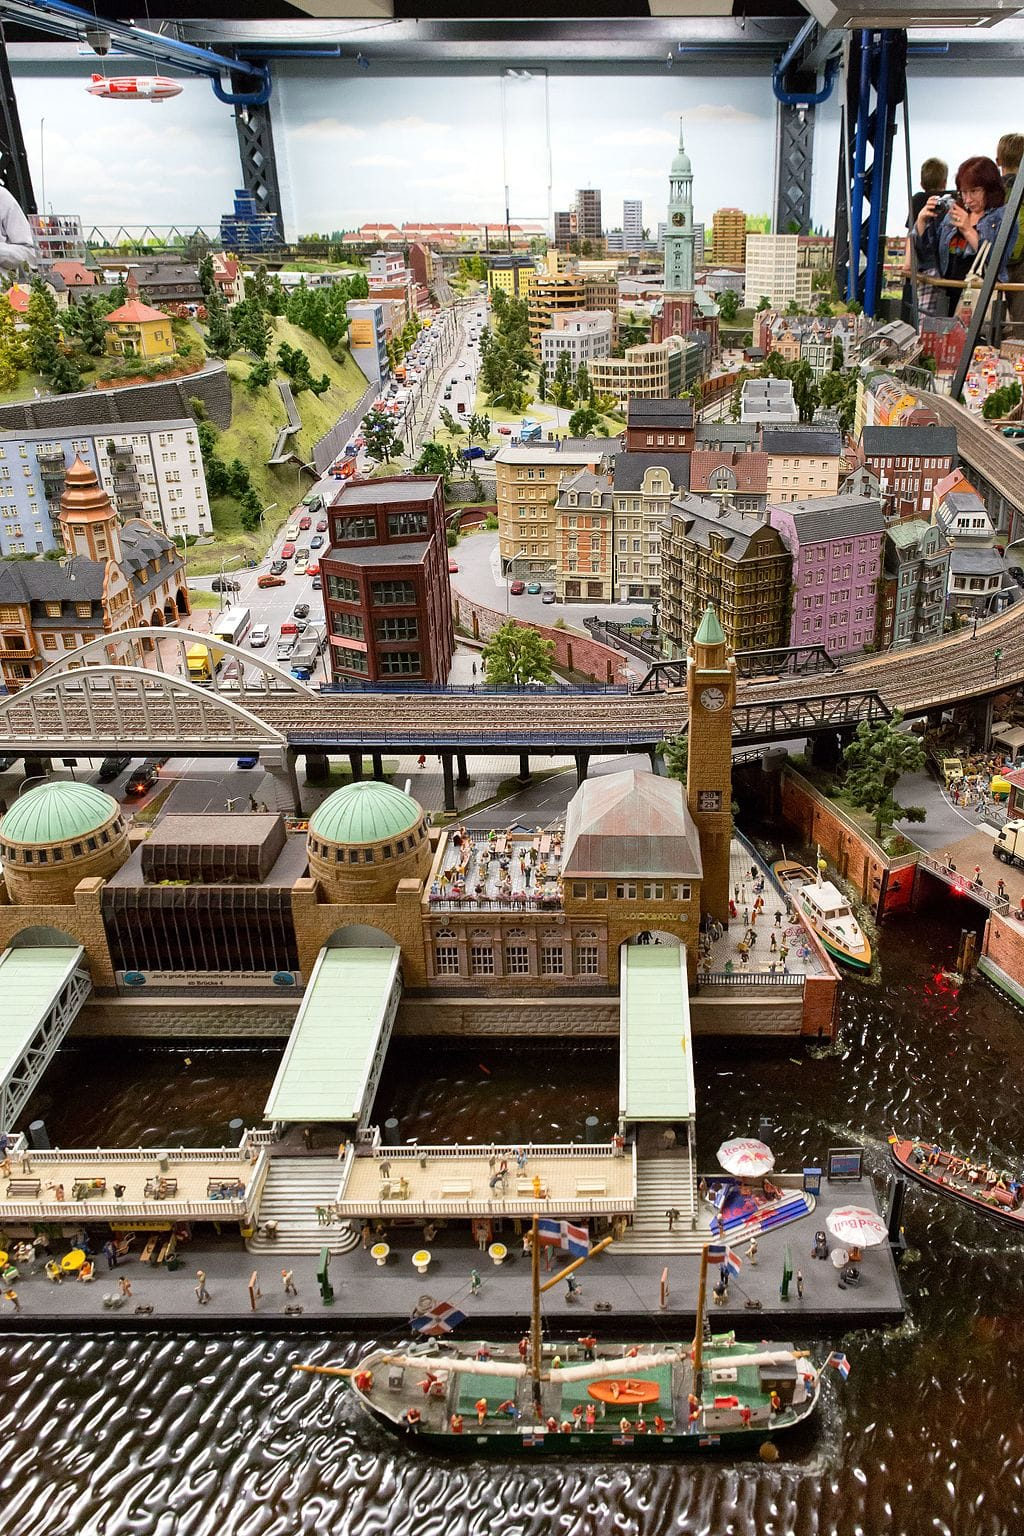 Hamburg_-_Miniatur_Wunderland_-_Hamburg_-_2016.jpg